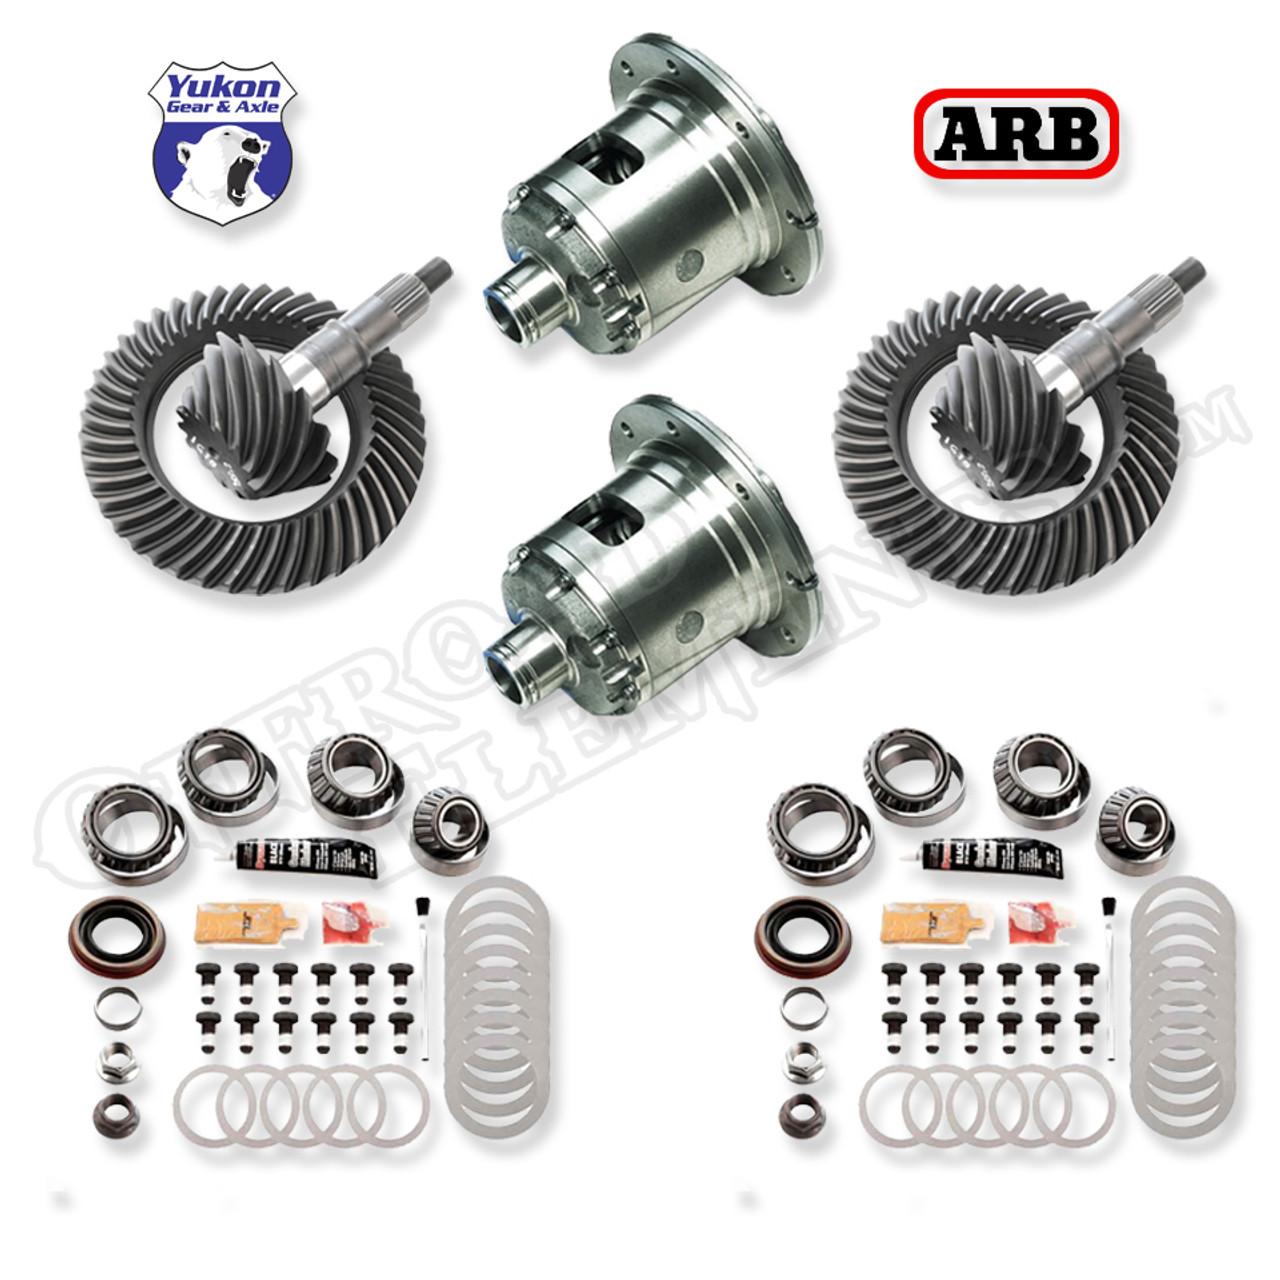 ARB and Yukon Gear & Lock Package